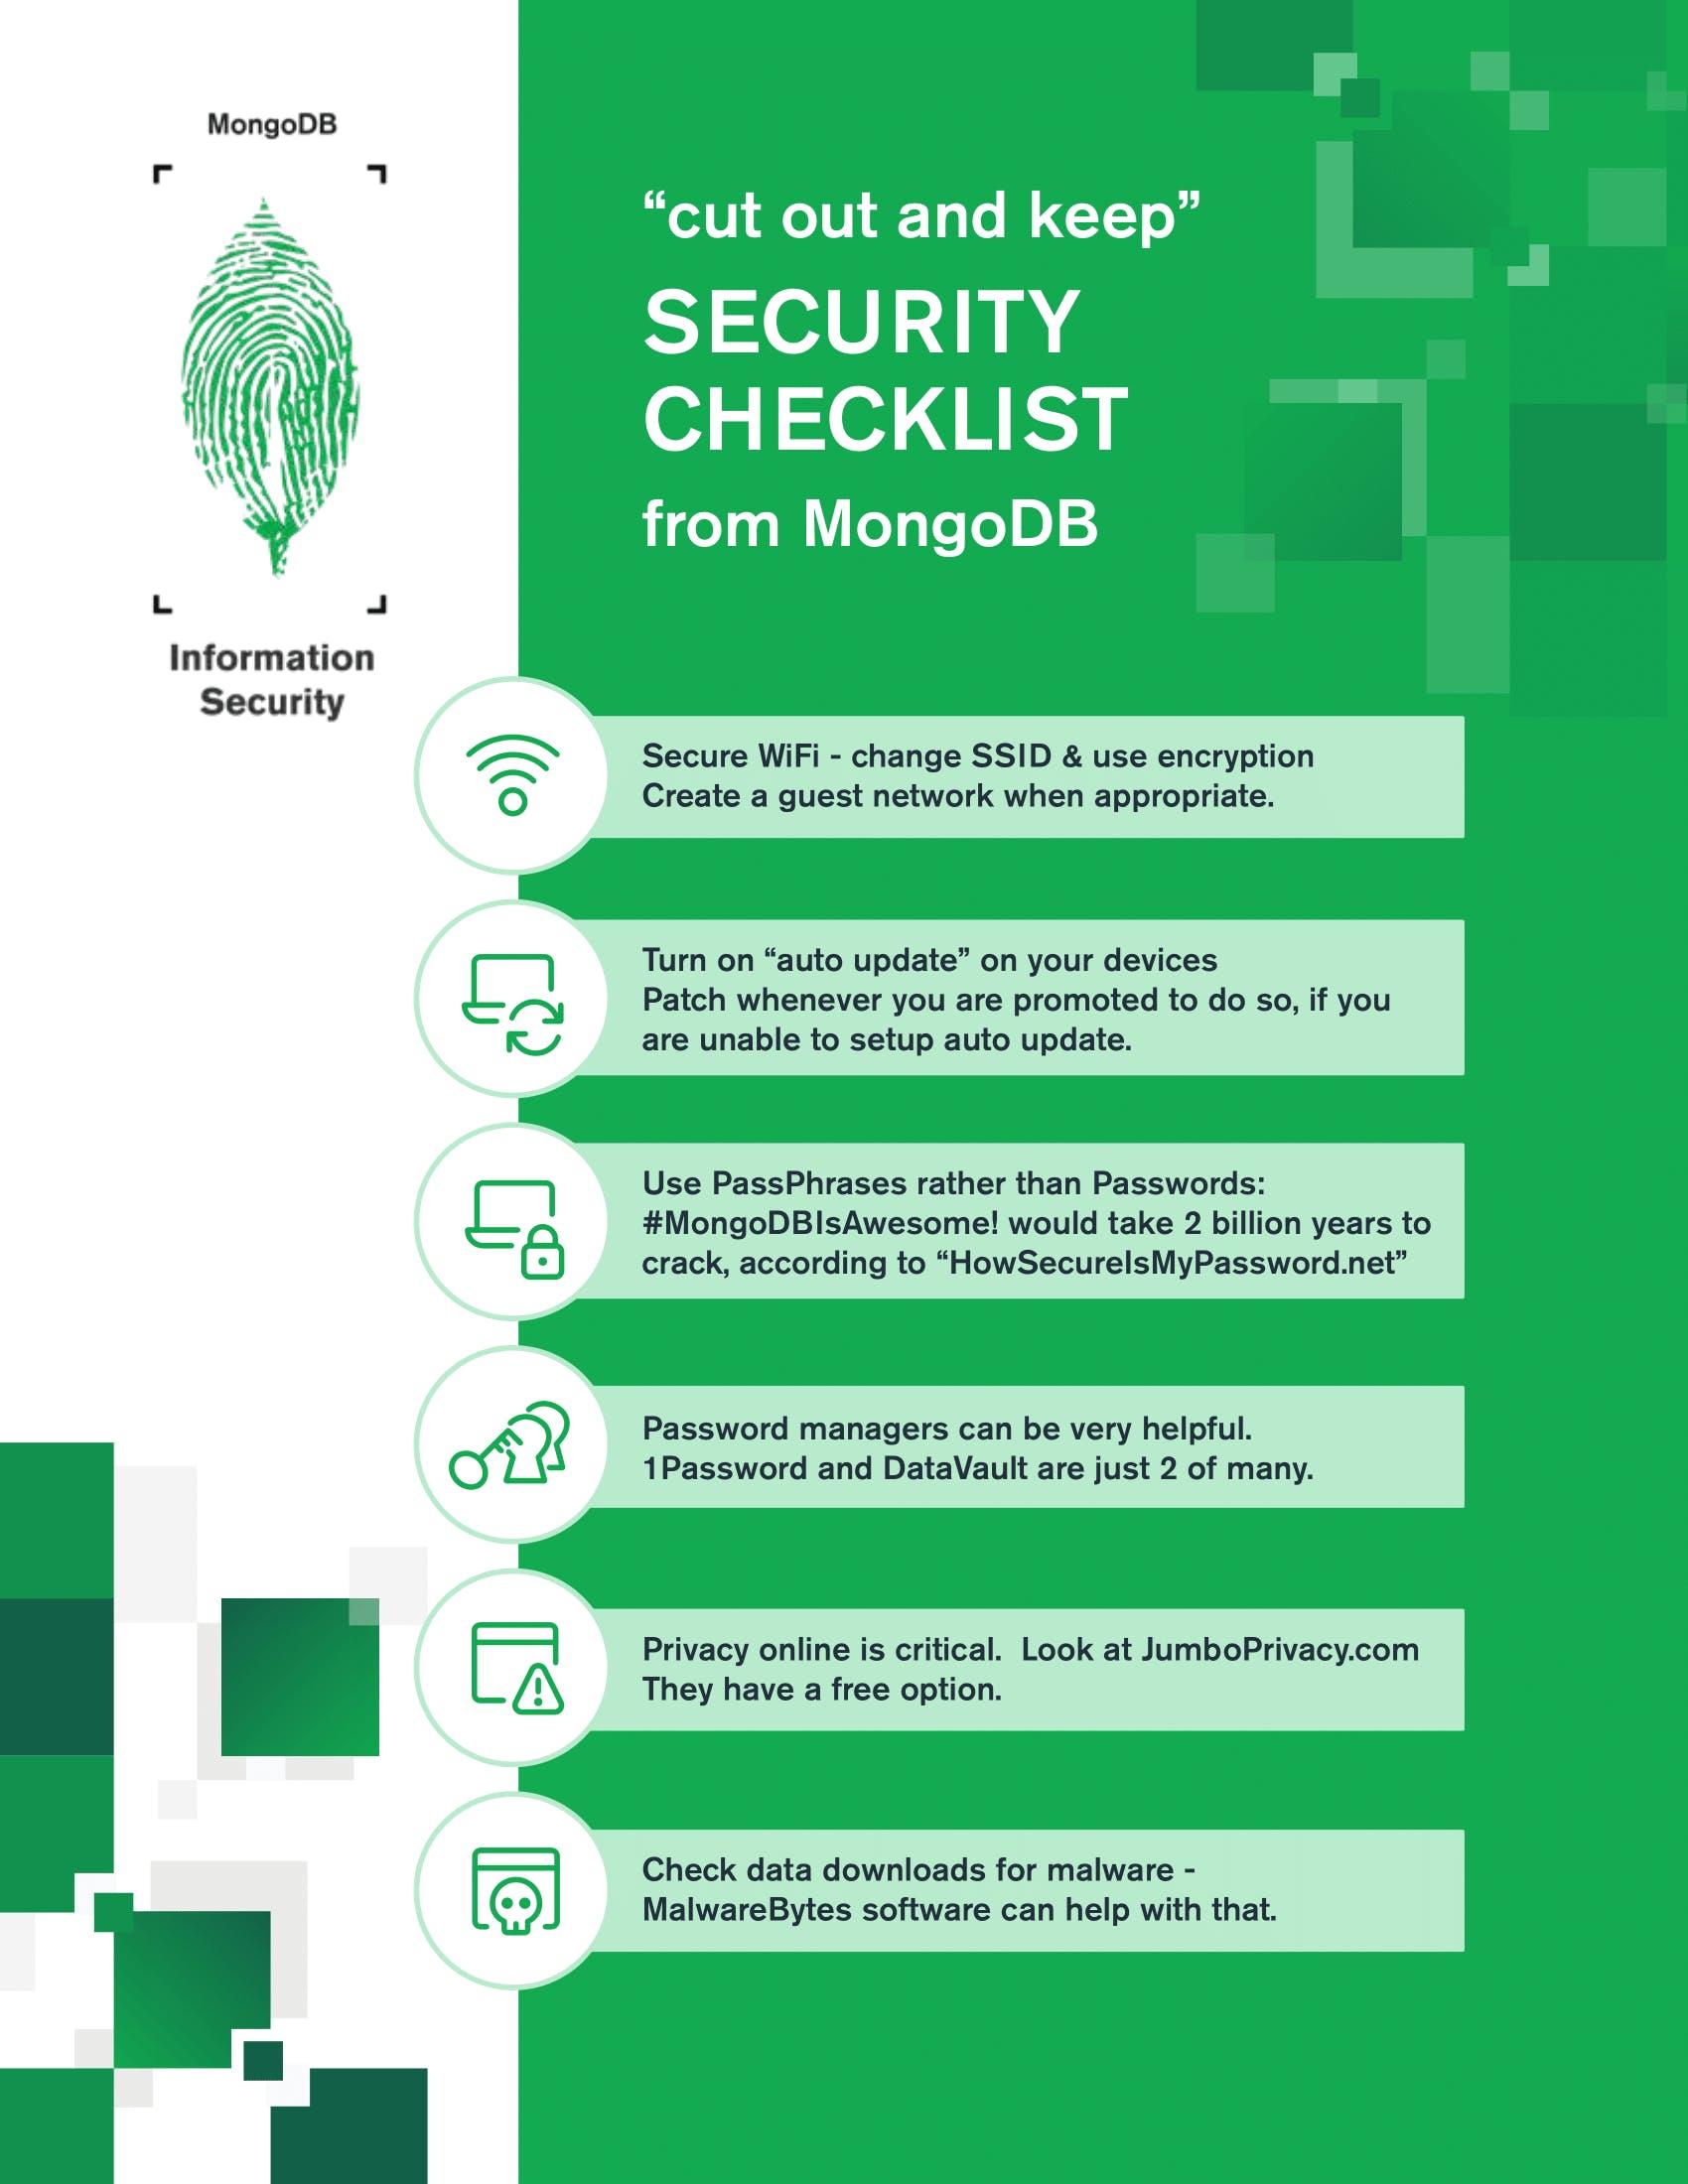 MongoDB WITI Webinar Security Checklist